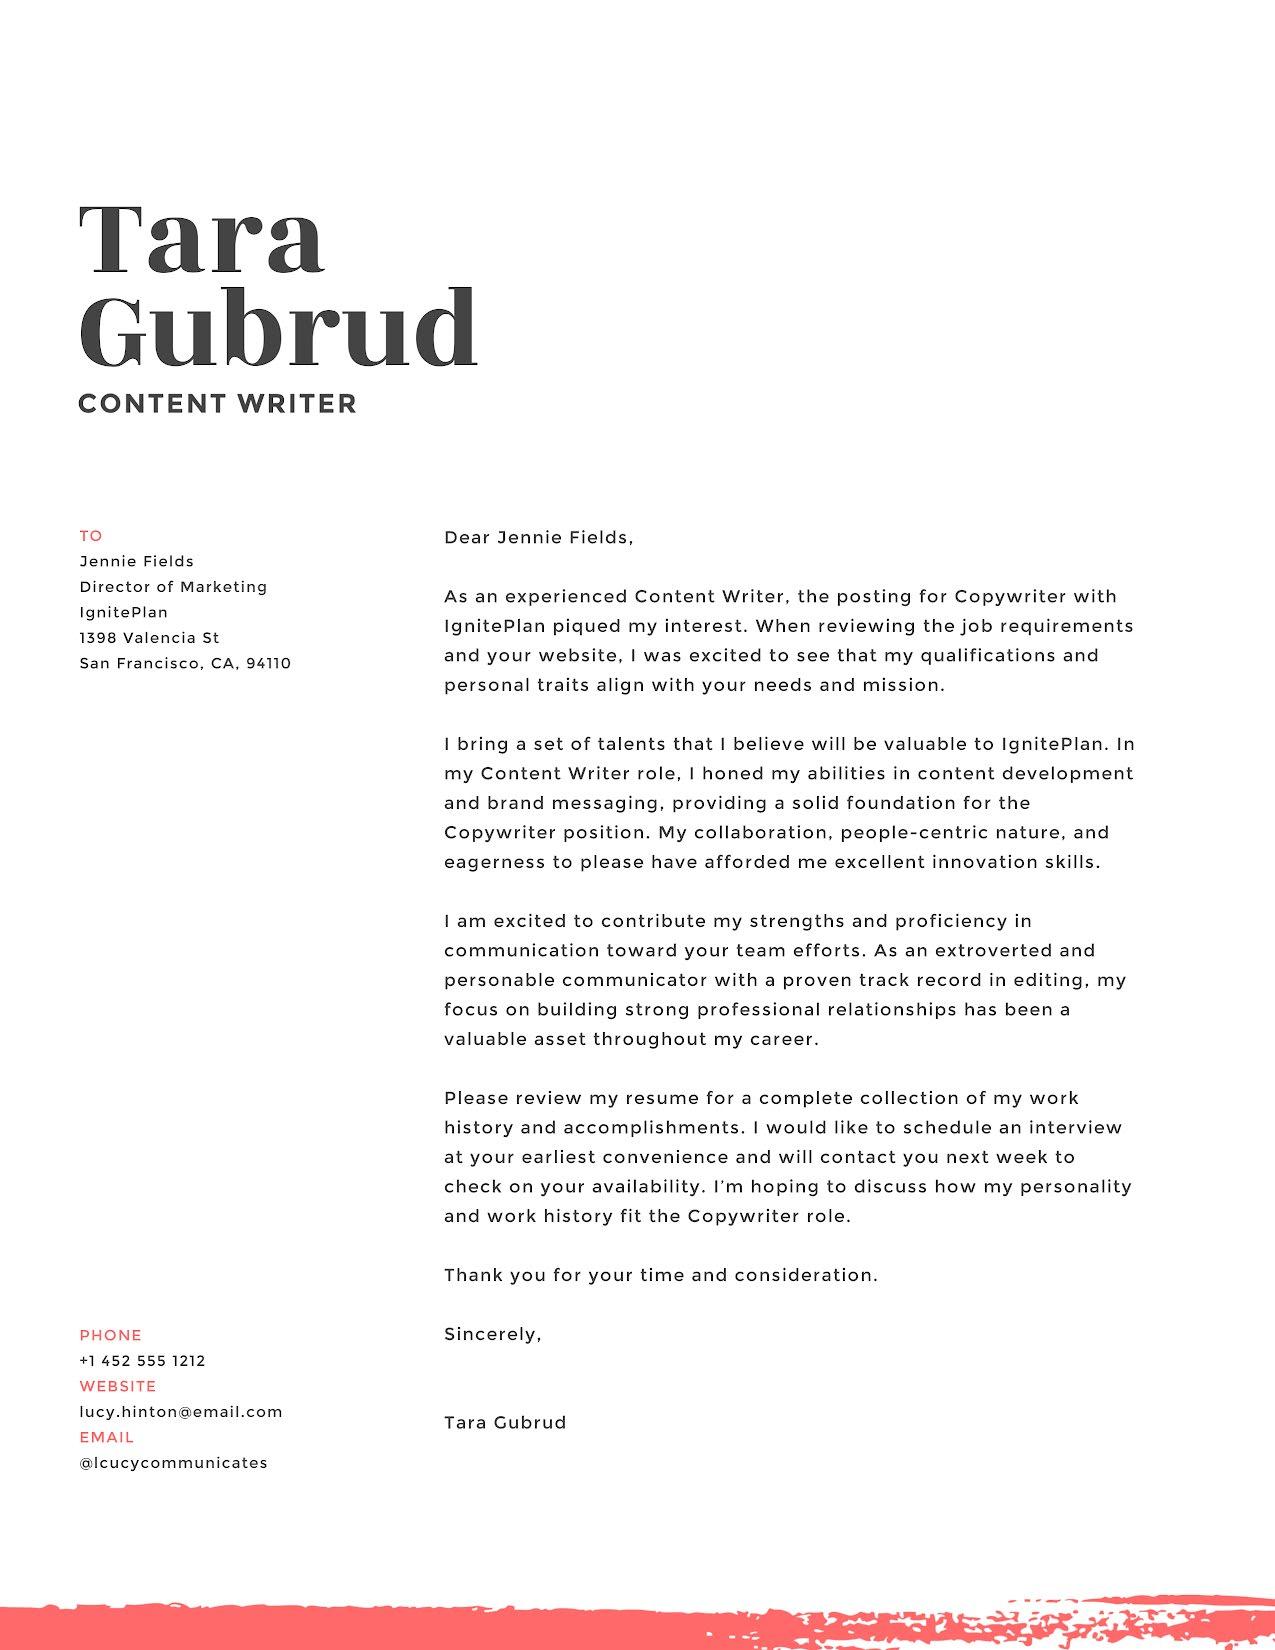 Tara Gubrud - Cover Letter Template